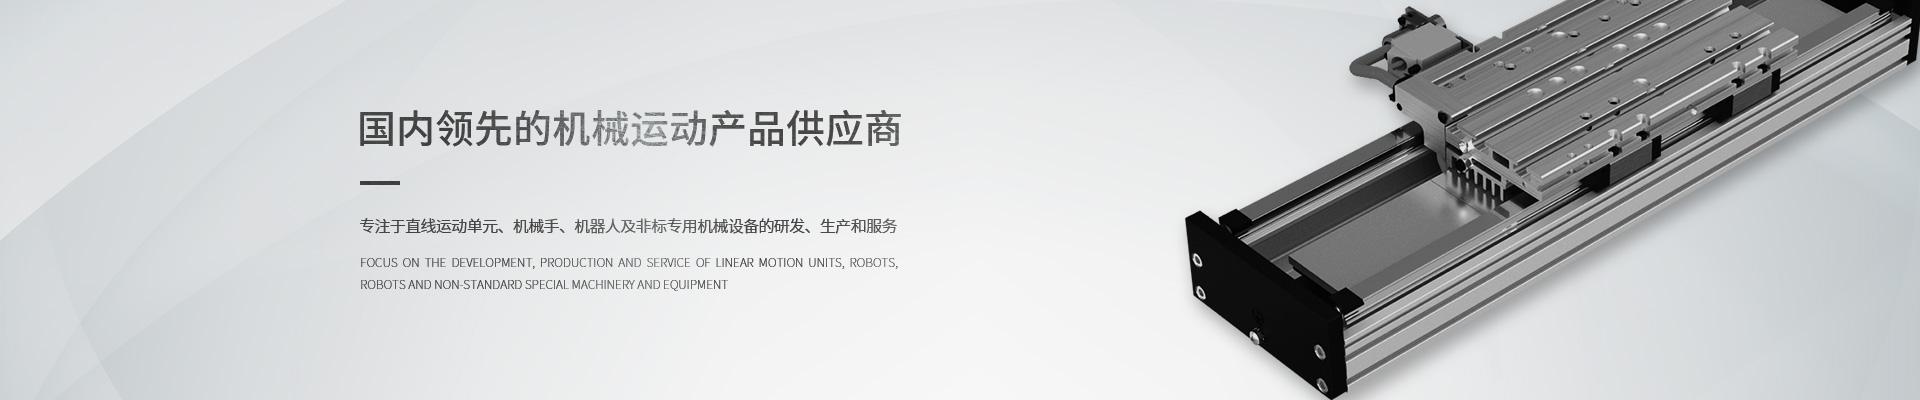 http://www.sz-konstun.com/data/upload/202101/20210120111205_328.jpg